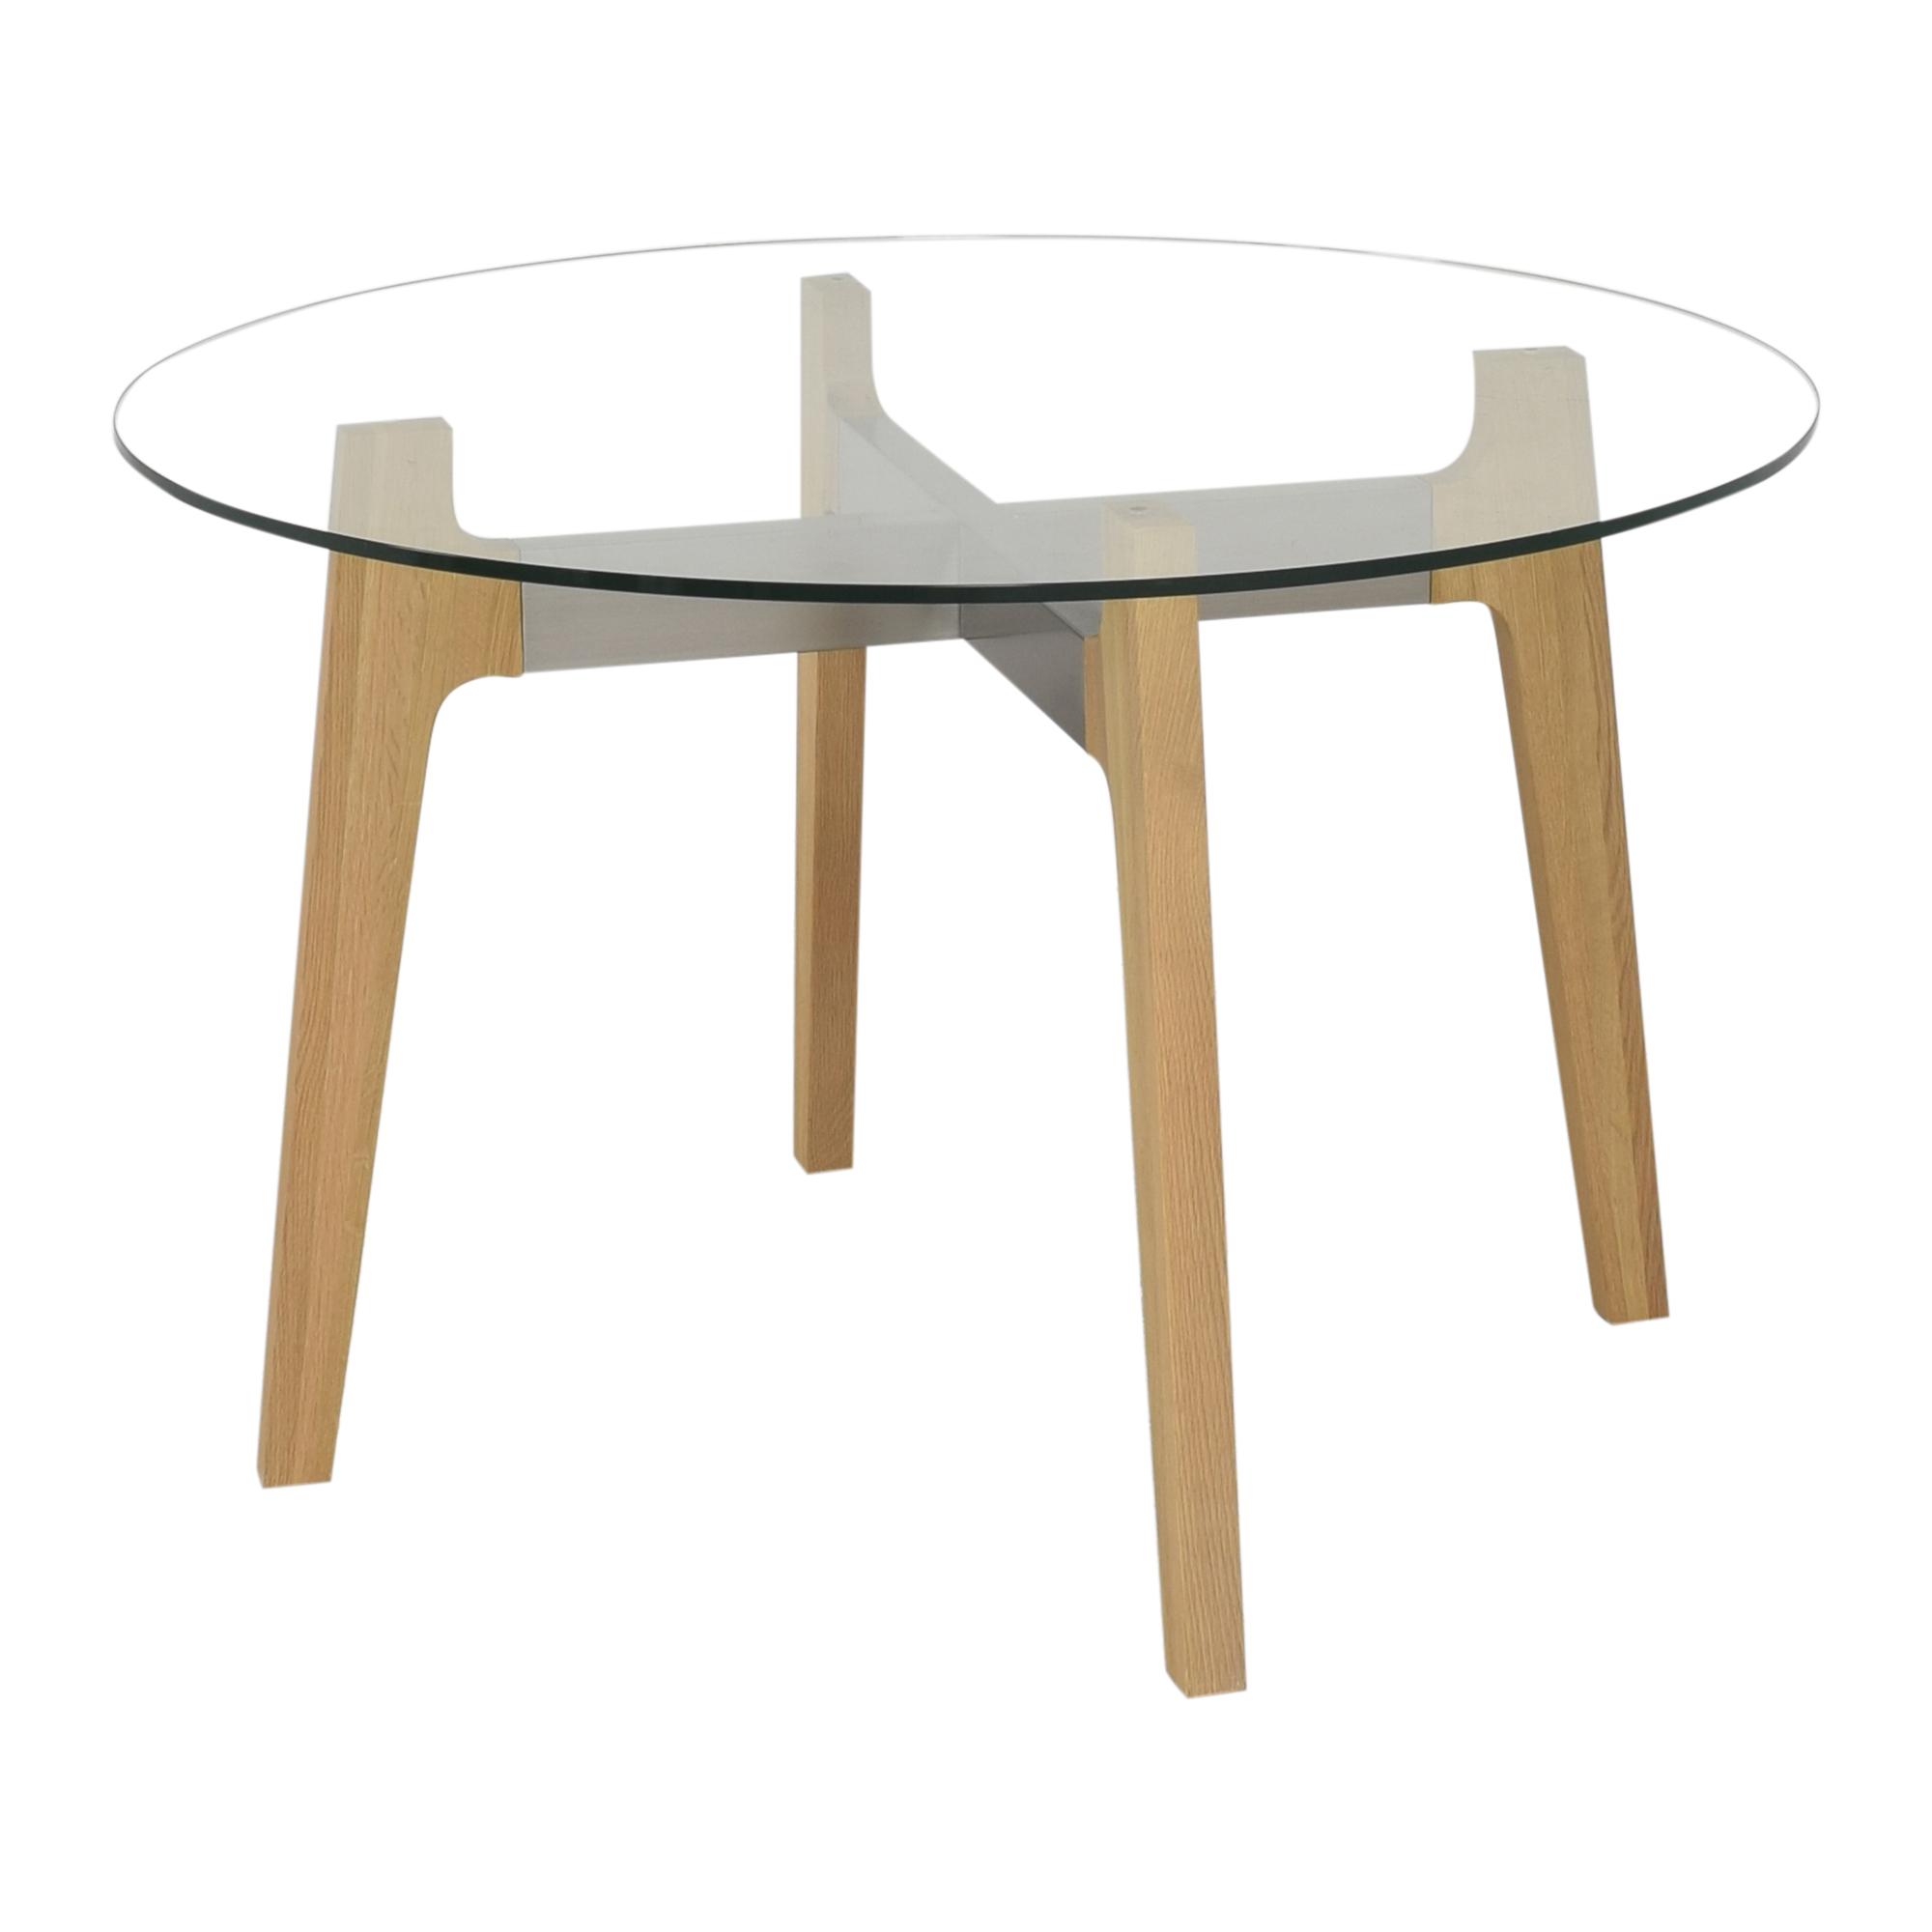 shop CB2 CB2 Brace Round Dining Table online